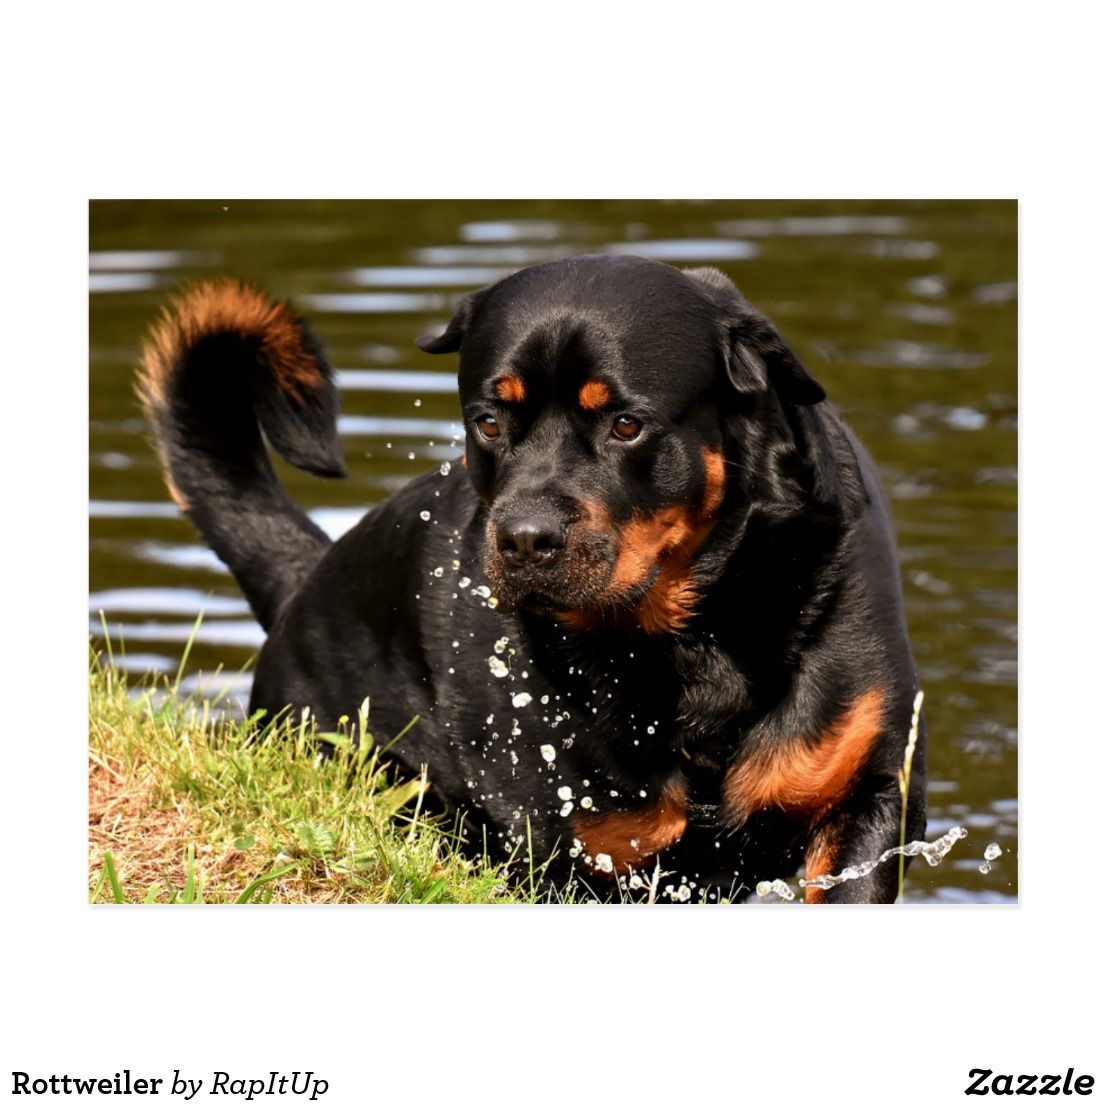 Rottweiler Postcard Zazzle Com Dog Breeds Rottweiler Dog